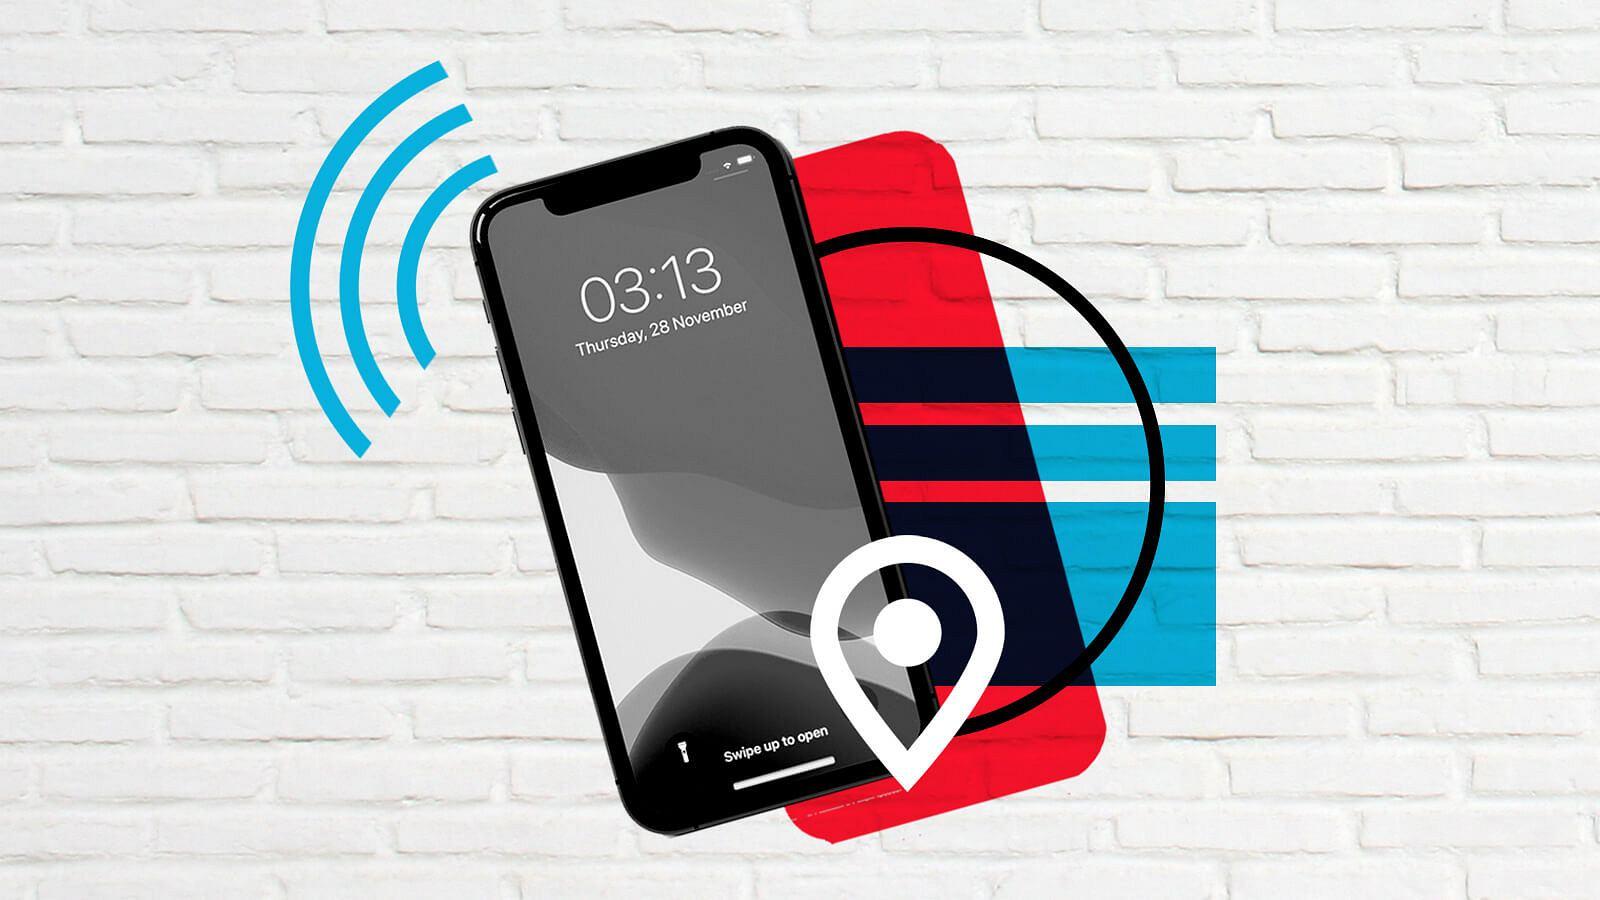 Handy orten: Die besten Ortungs-Apps